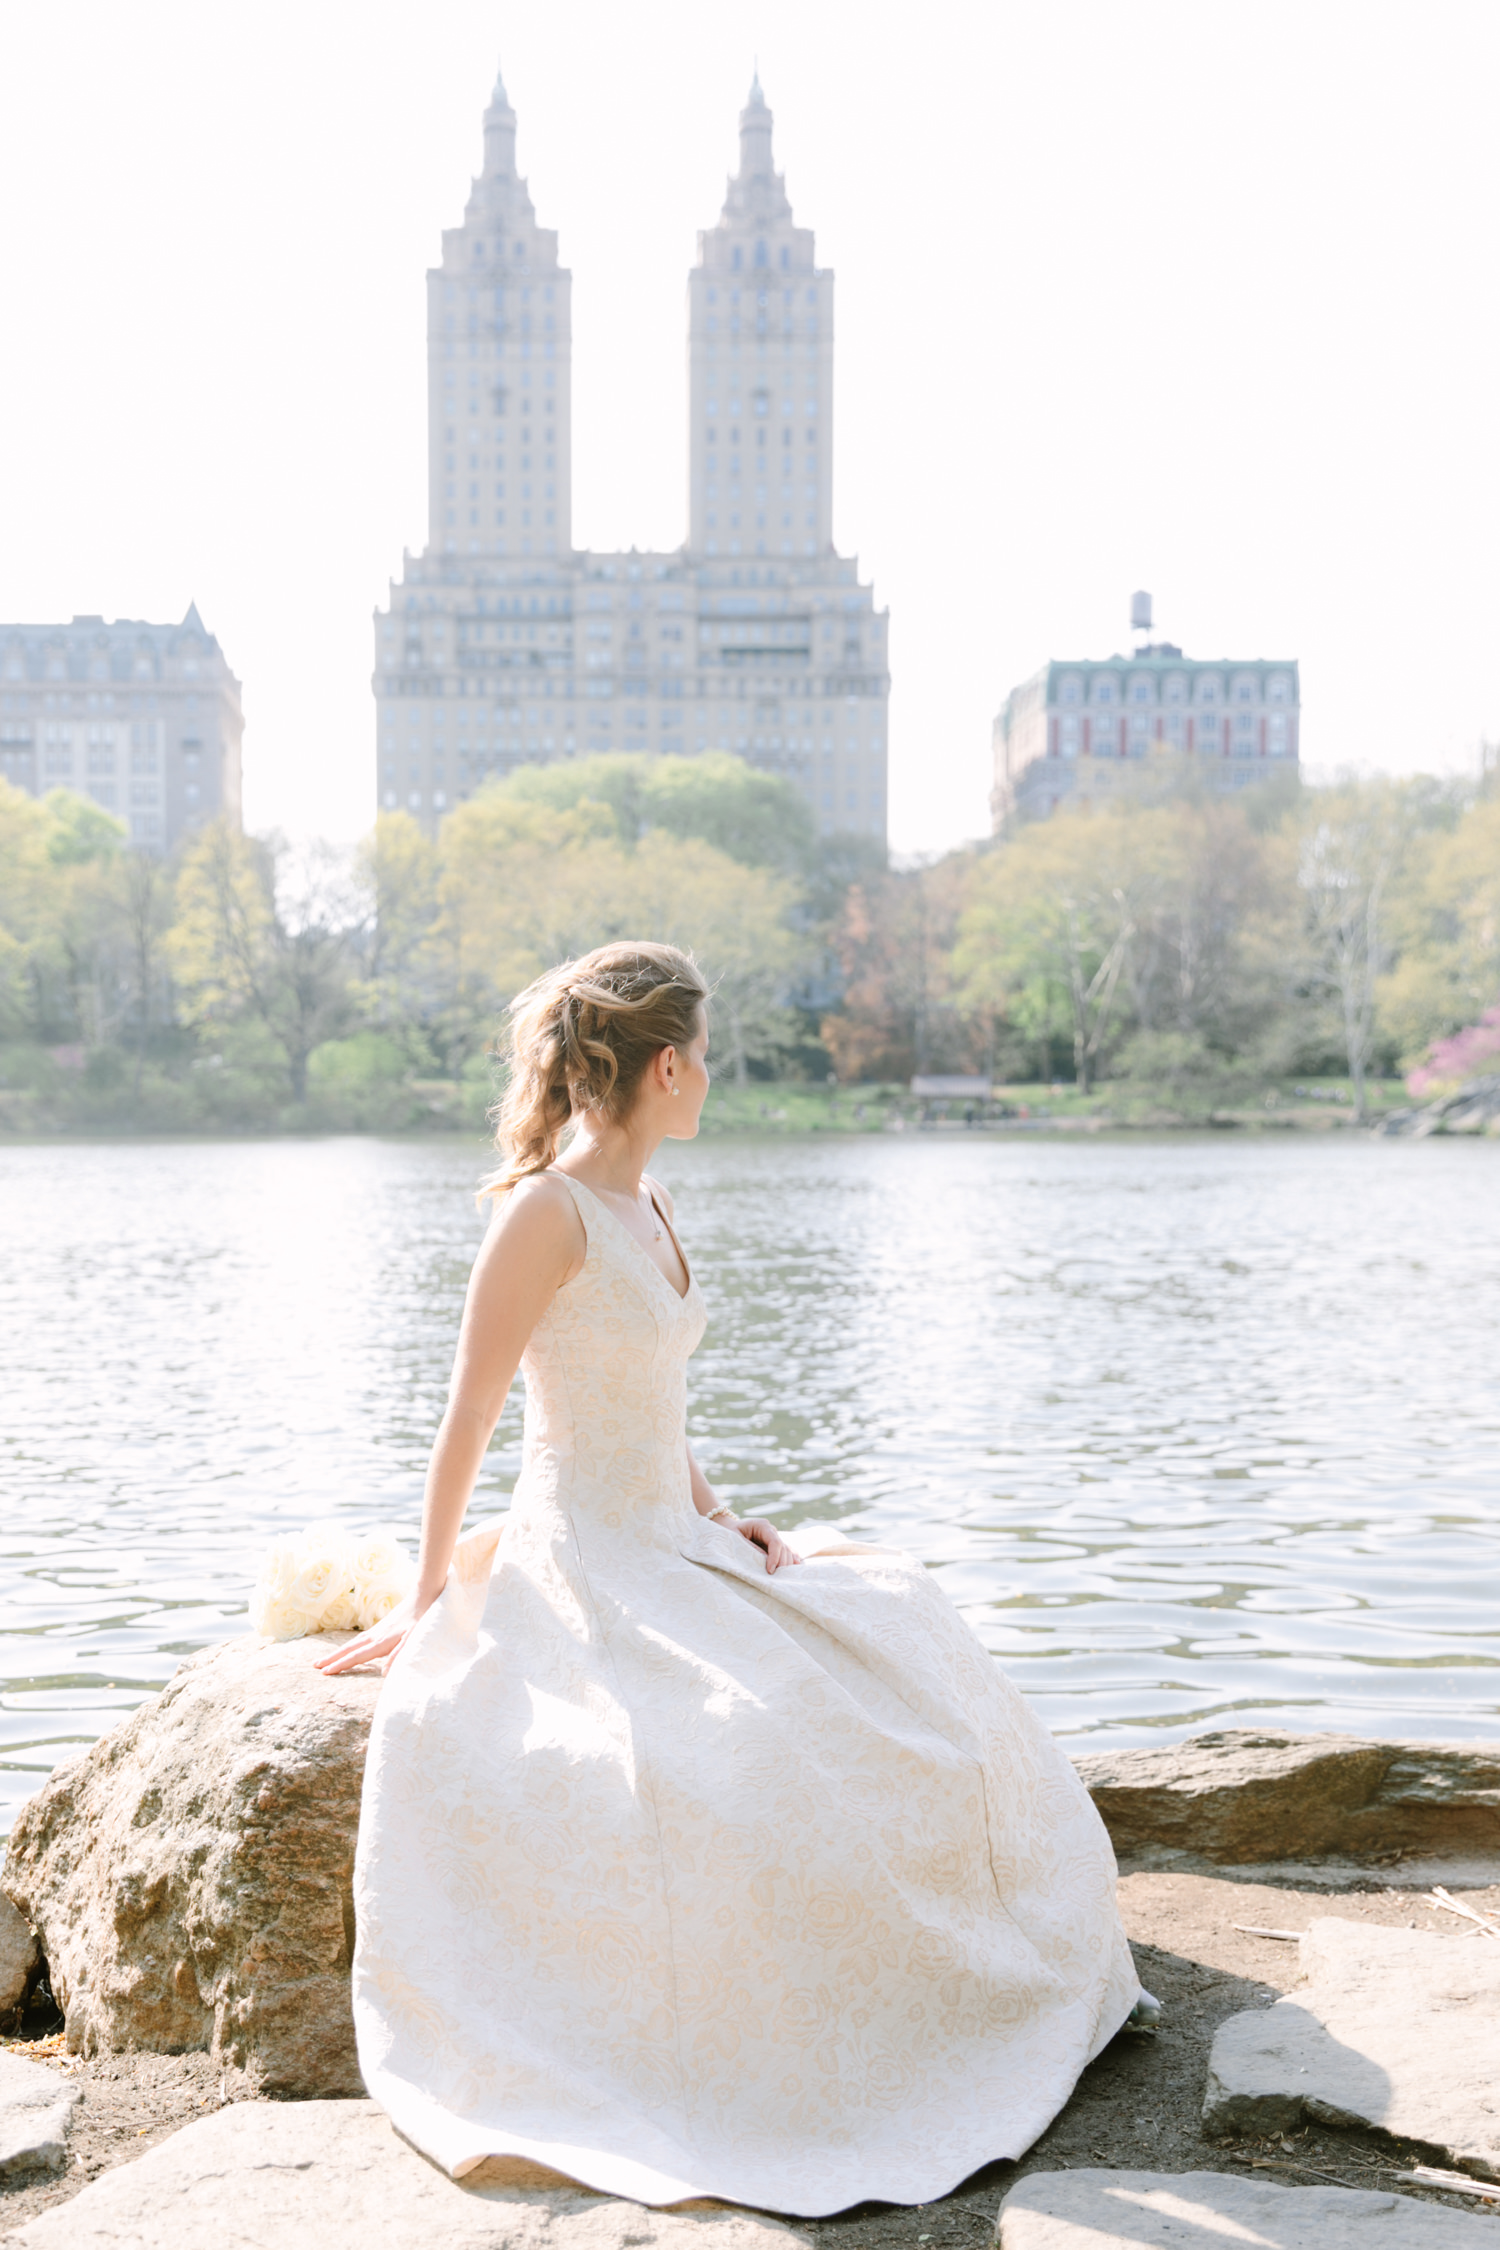 NYC-Top-of-the-Rock-wedding-photos-L&B-1.jpg